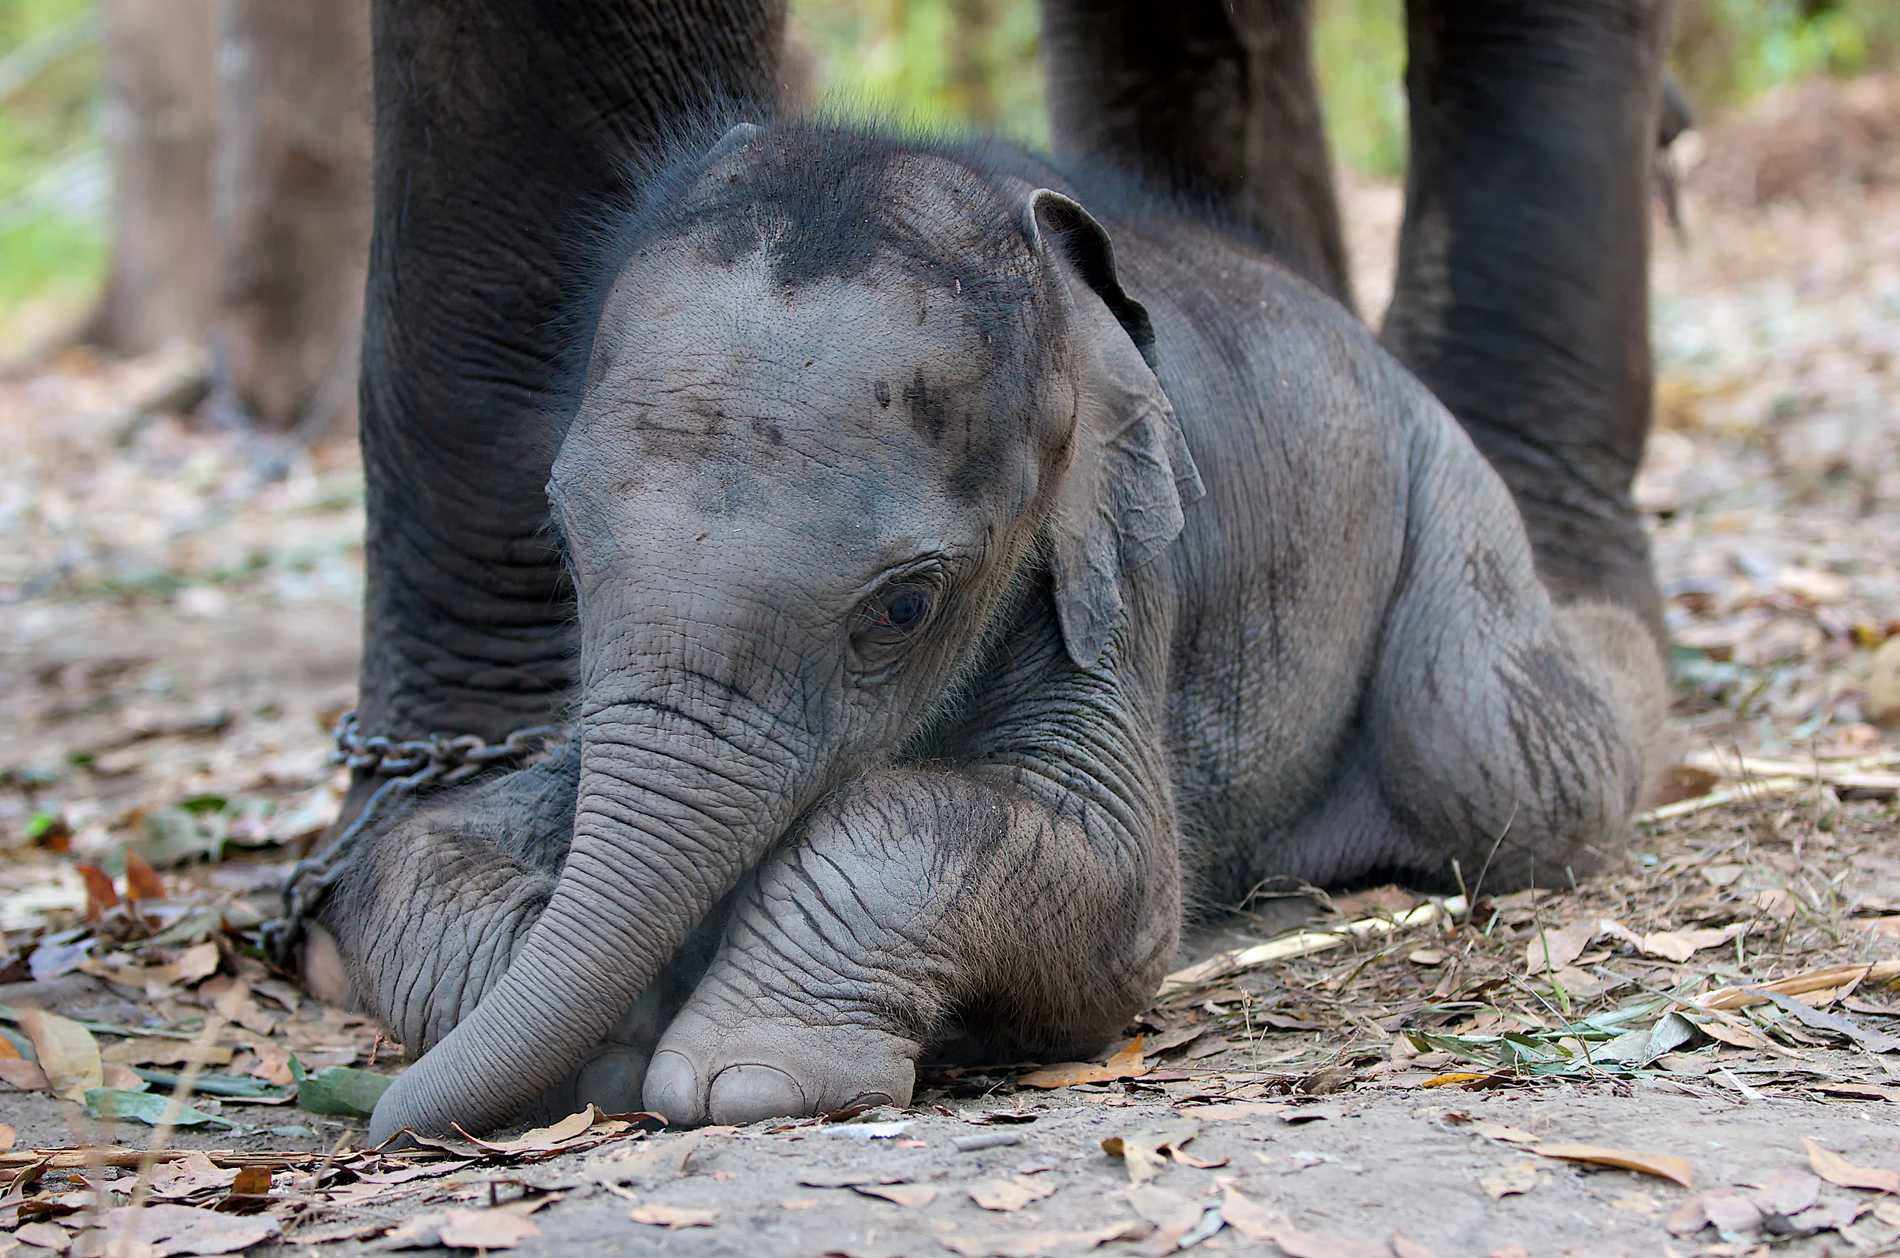 Elefantridning drabbar ofta djuren negativt.